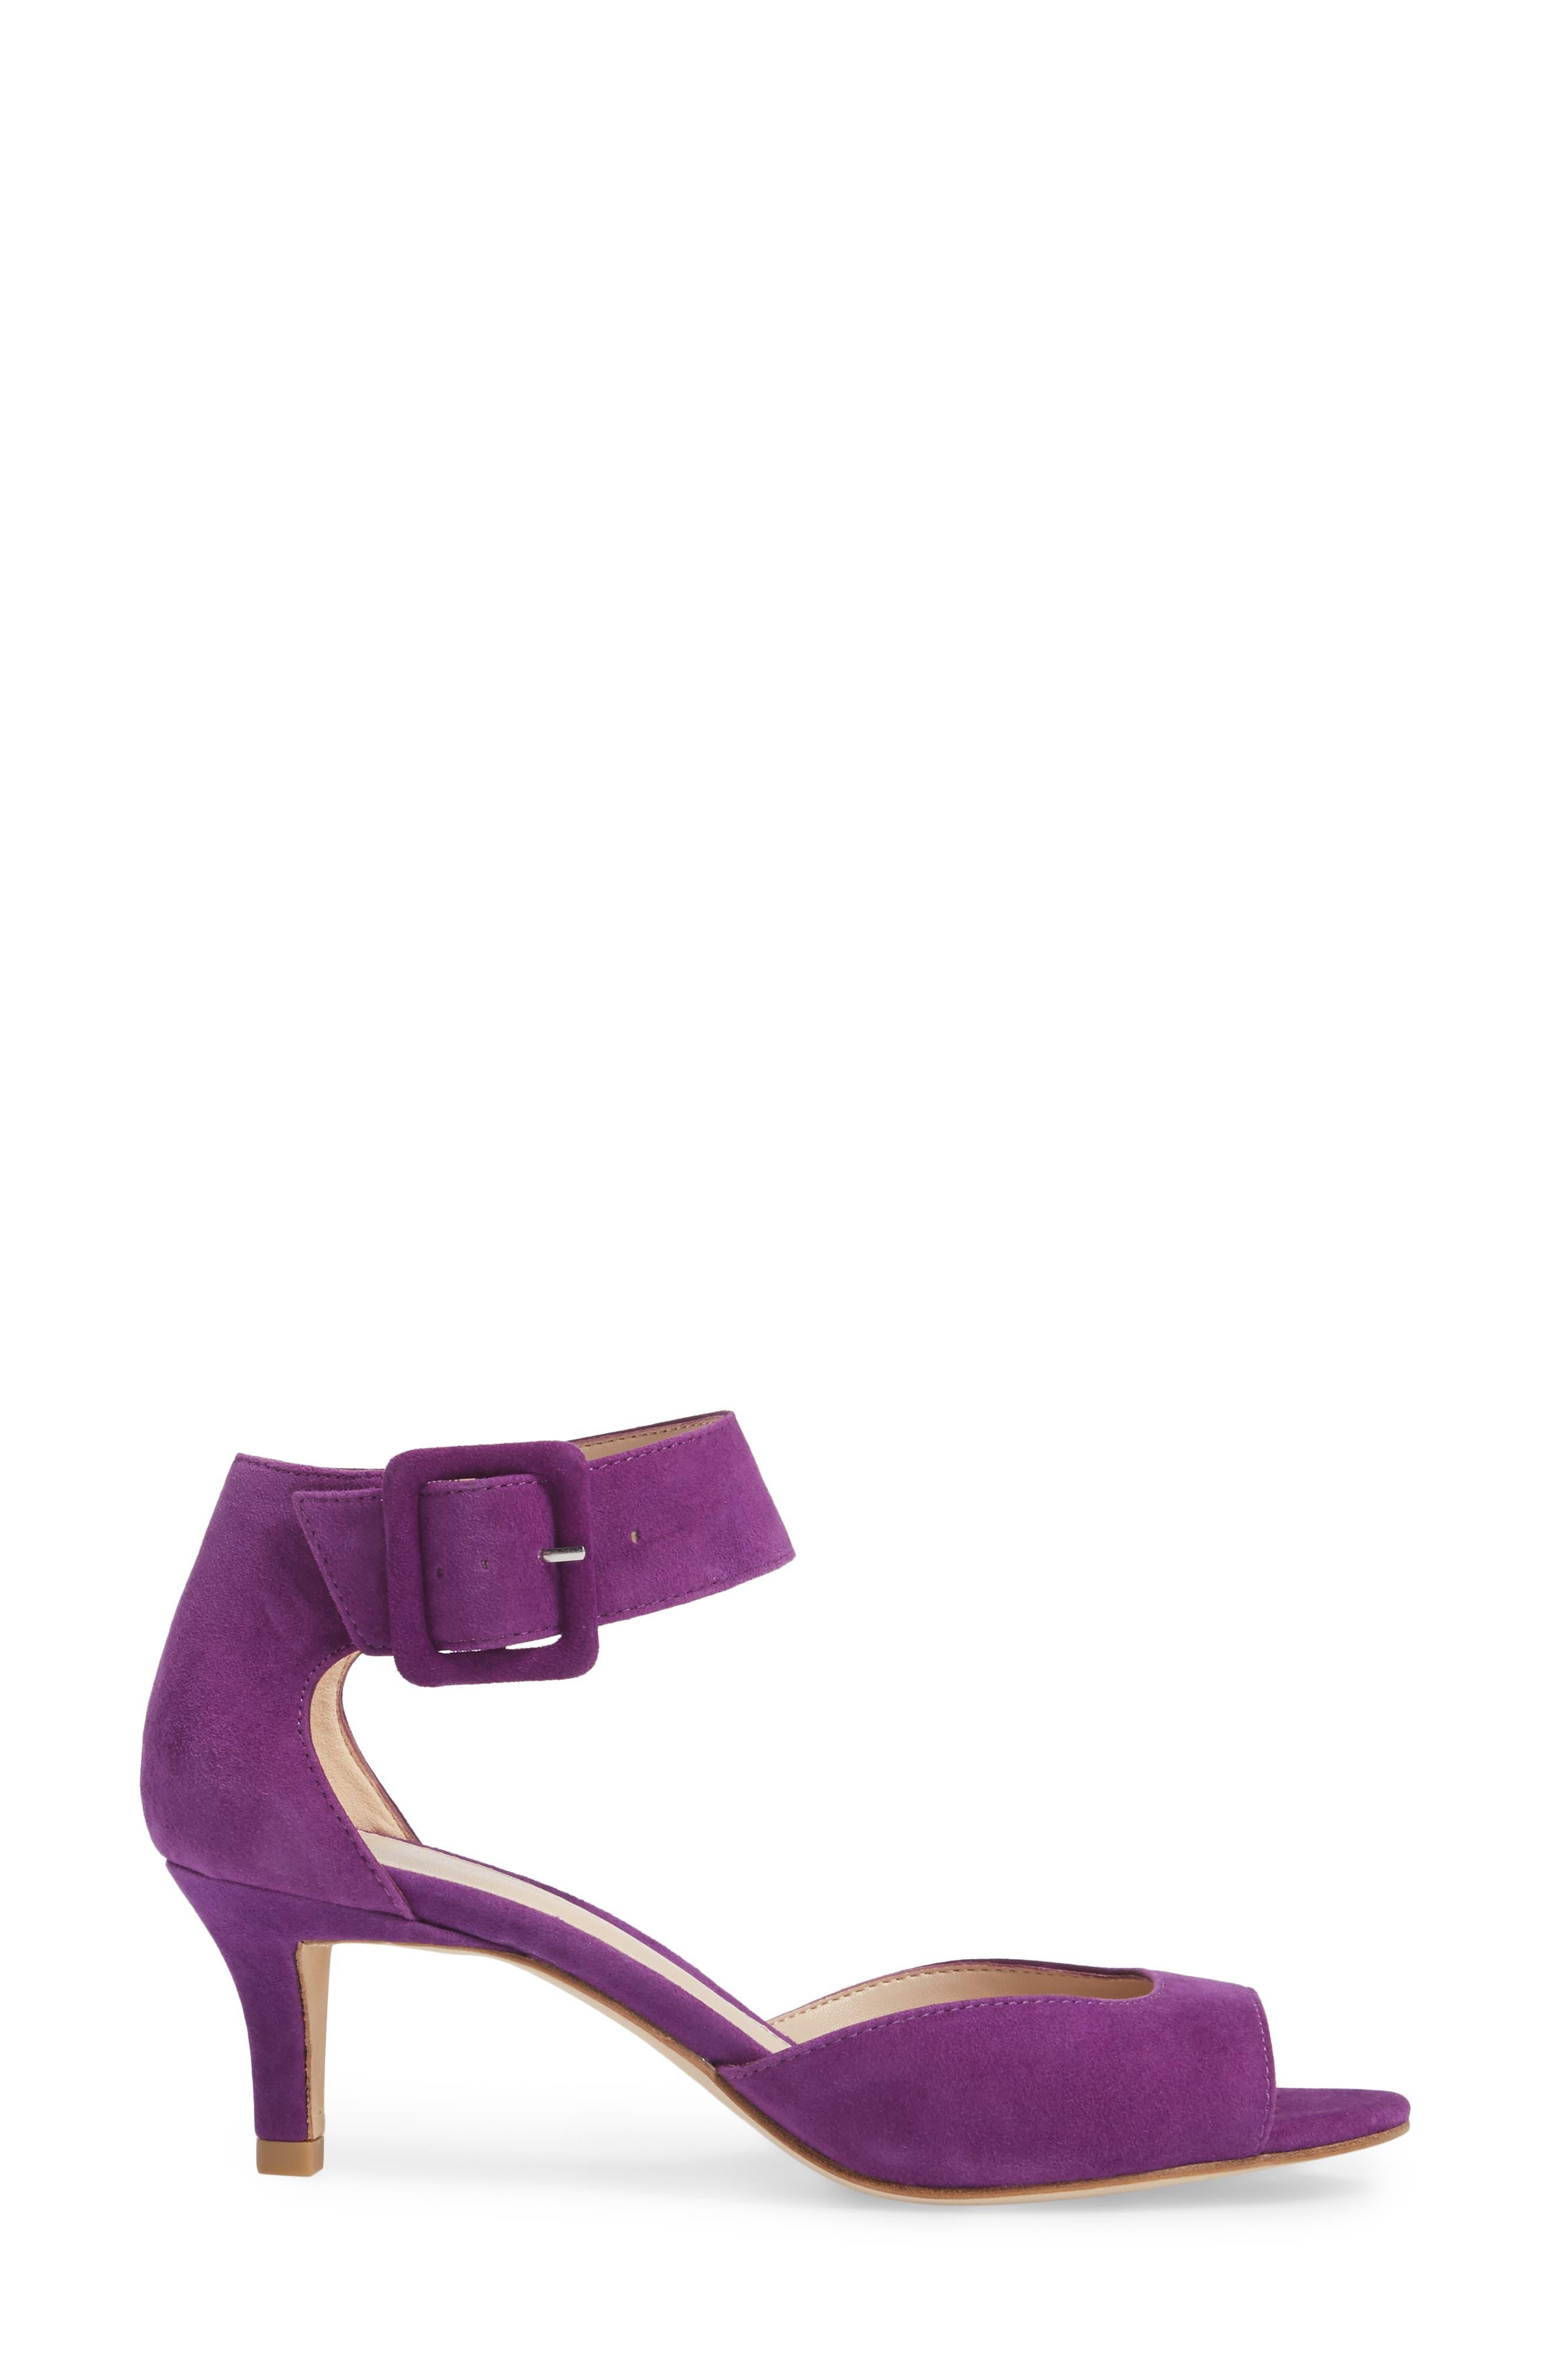 'Berlin' Ankle Strap Sandal,                             Alternate thumbnail 26, color,